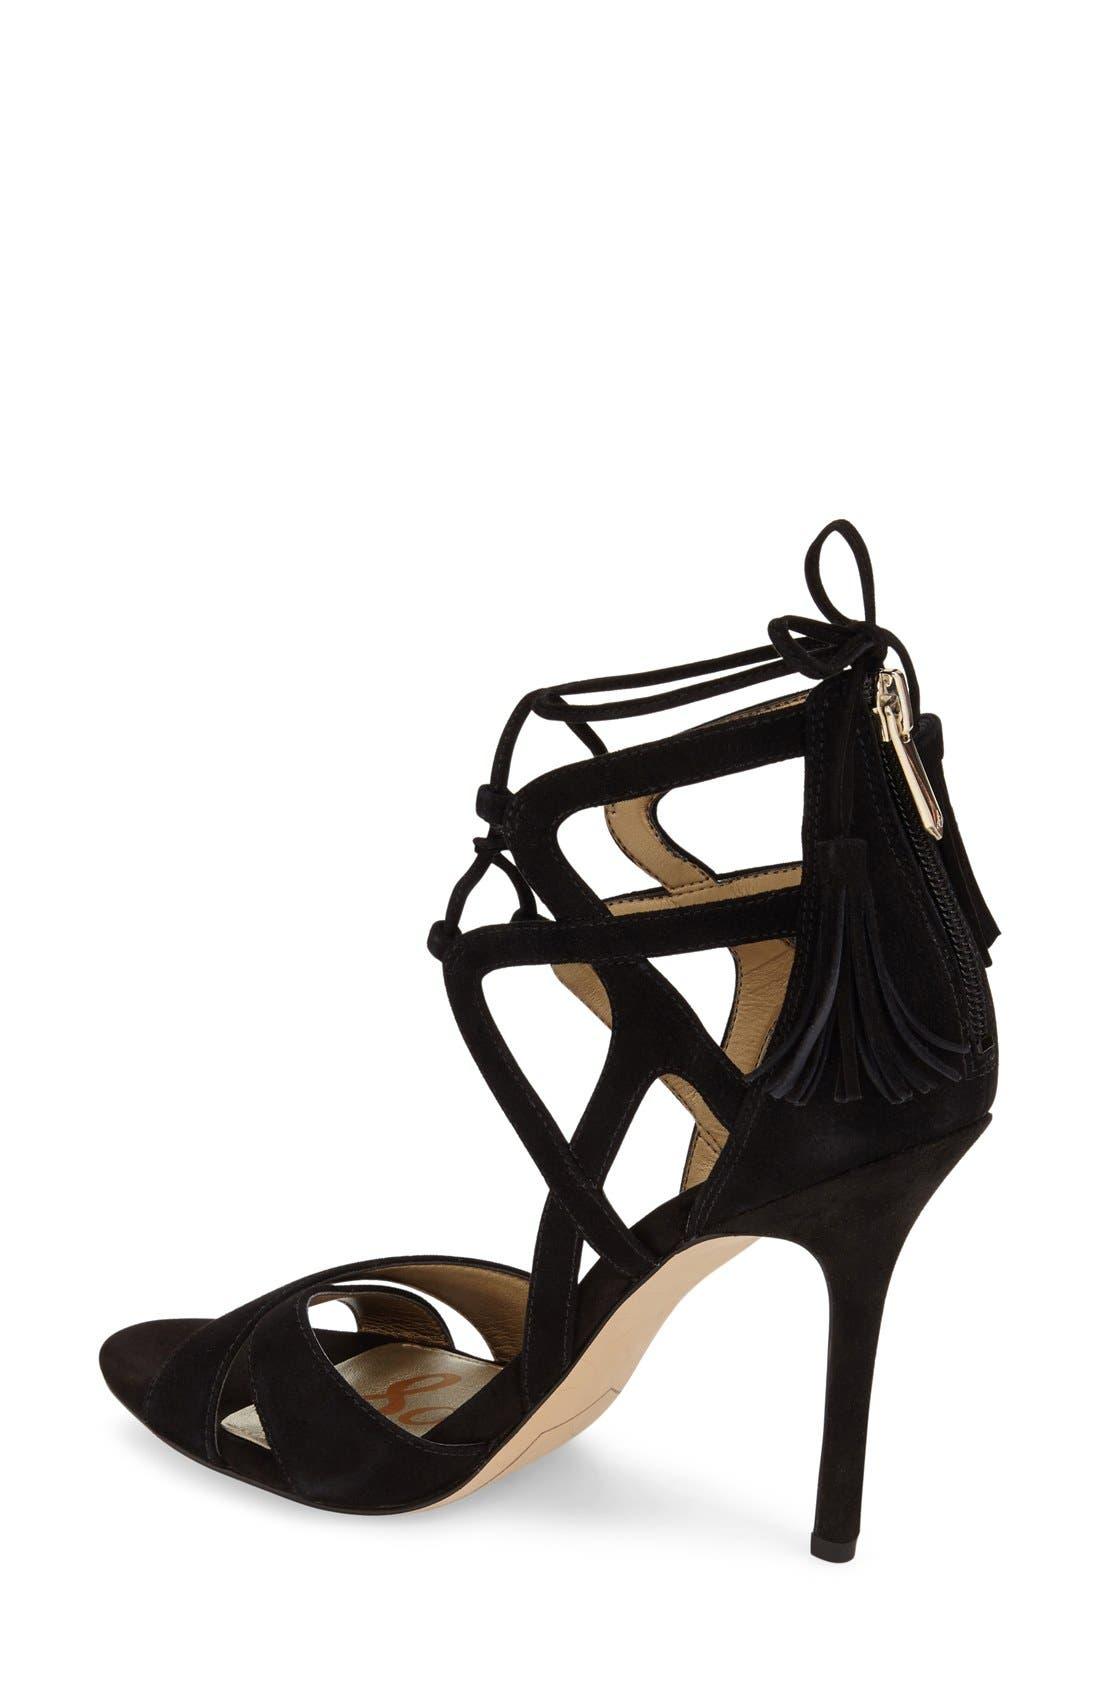 'Azela' Tasseled Lace-Up Sandal,                             Alternate thumbnail 2, color,                             Black Suede